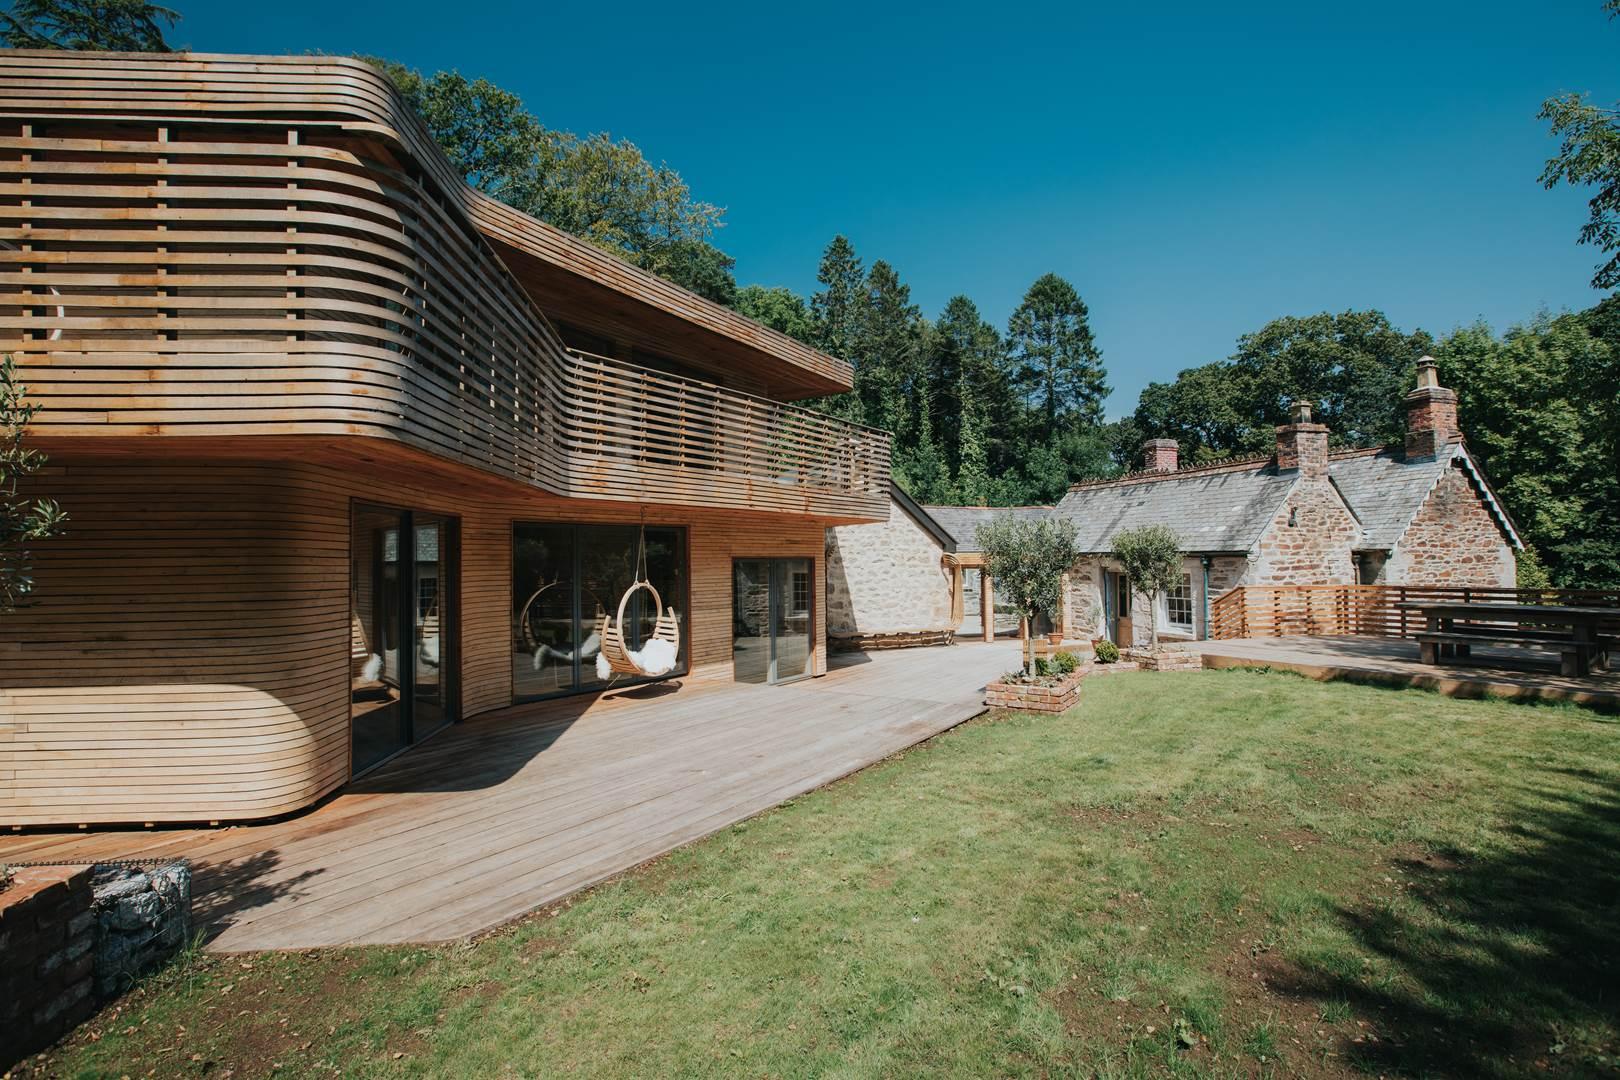 079-tom-raffield-grand-designs-house (Copy)